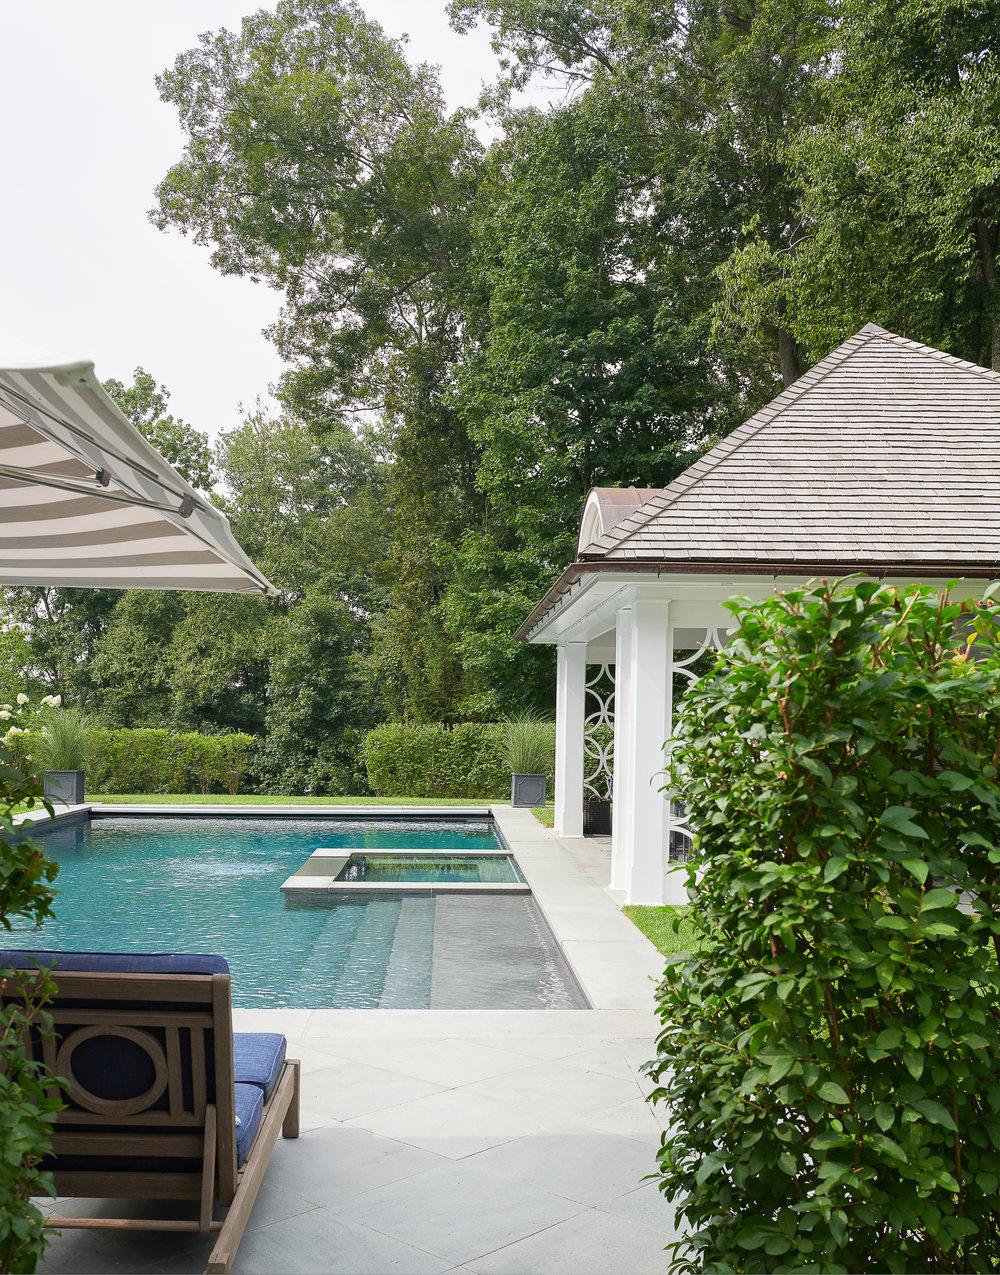 Hilderbrand-Interiors_Poolhouse-New-canaan-outdoor-living-©Jane Beiles-1808174975.jpg